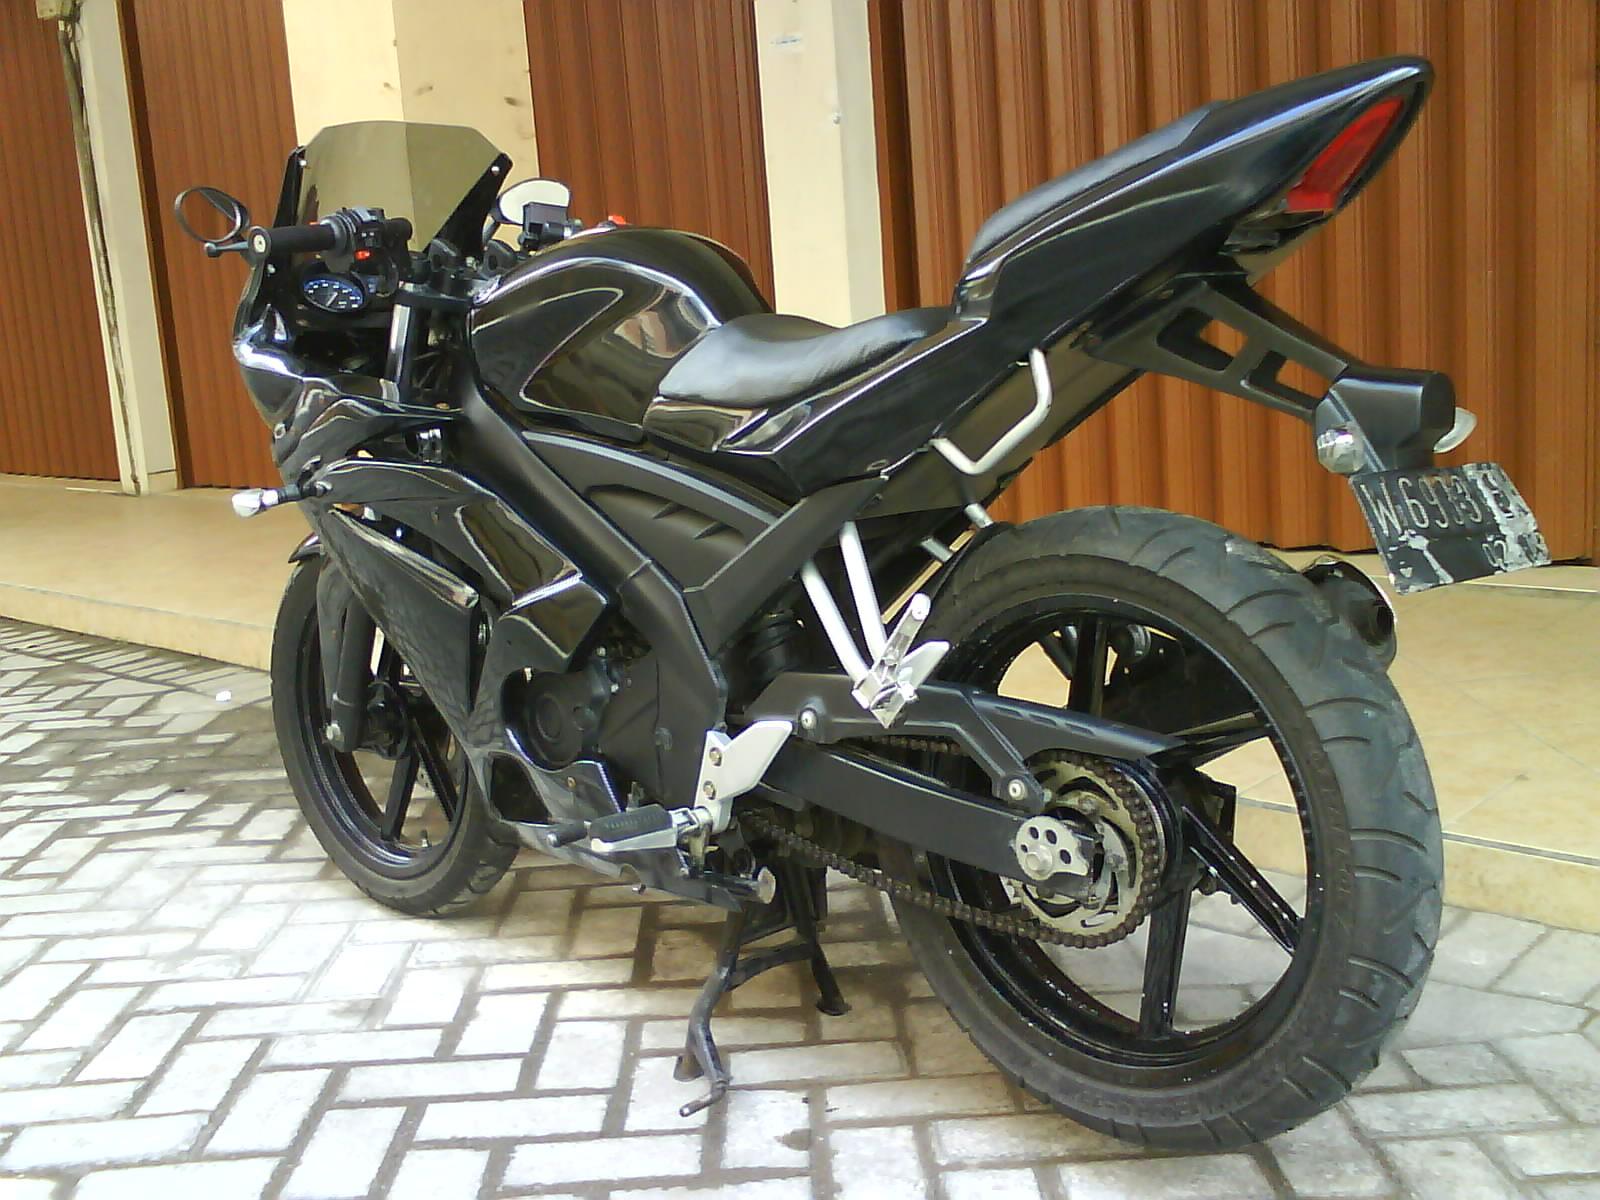 Modifikasi Motor Vixion 2015 Warna Hitam Terkeren Sukaon